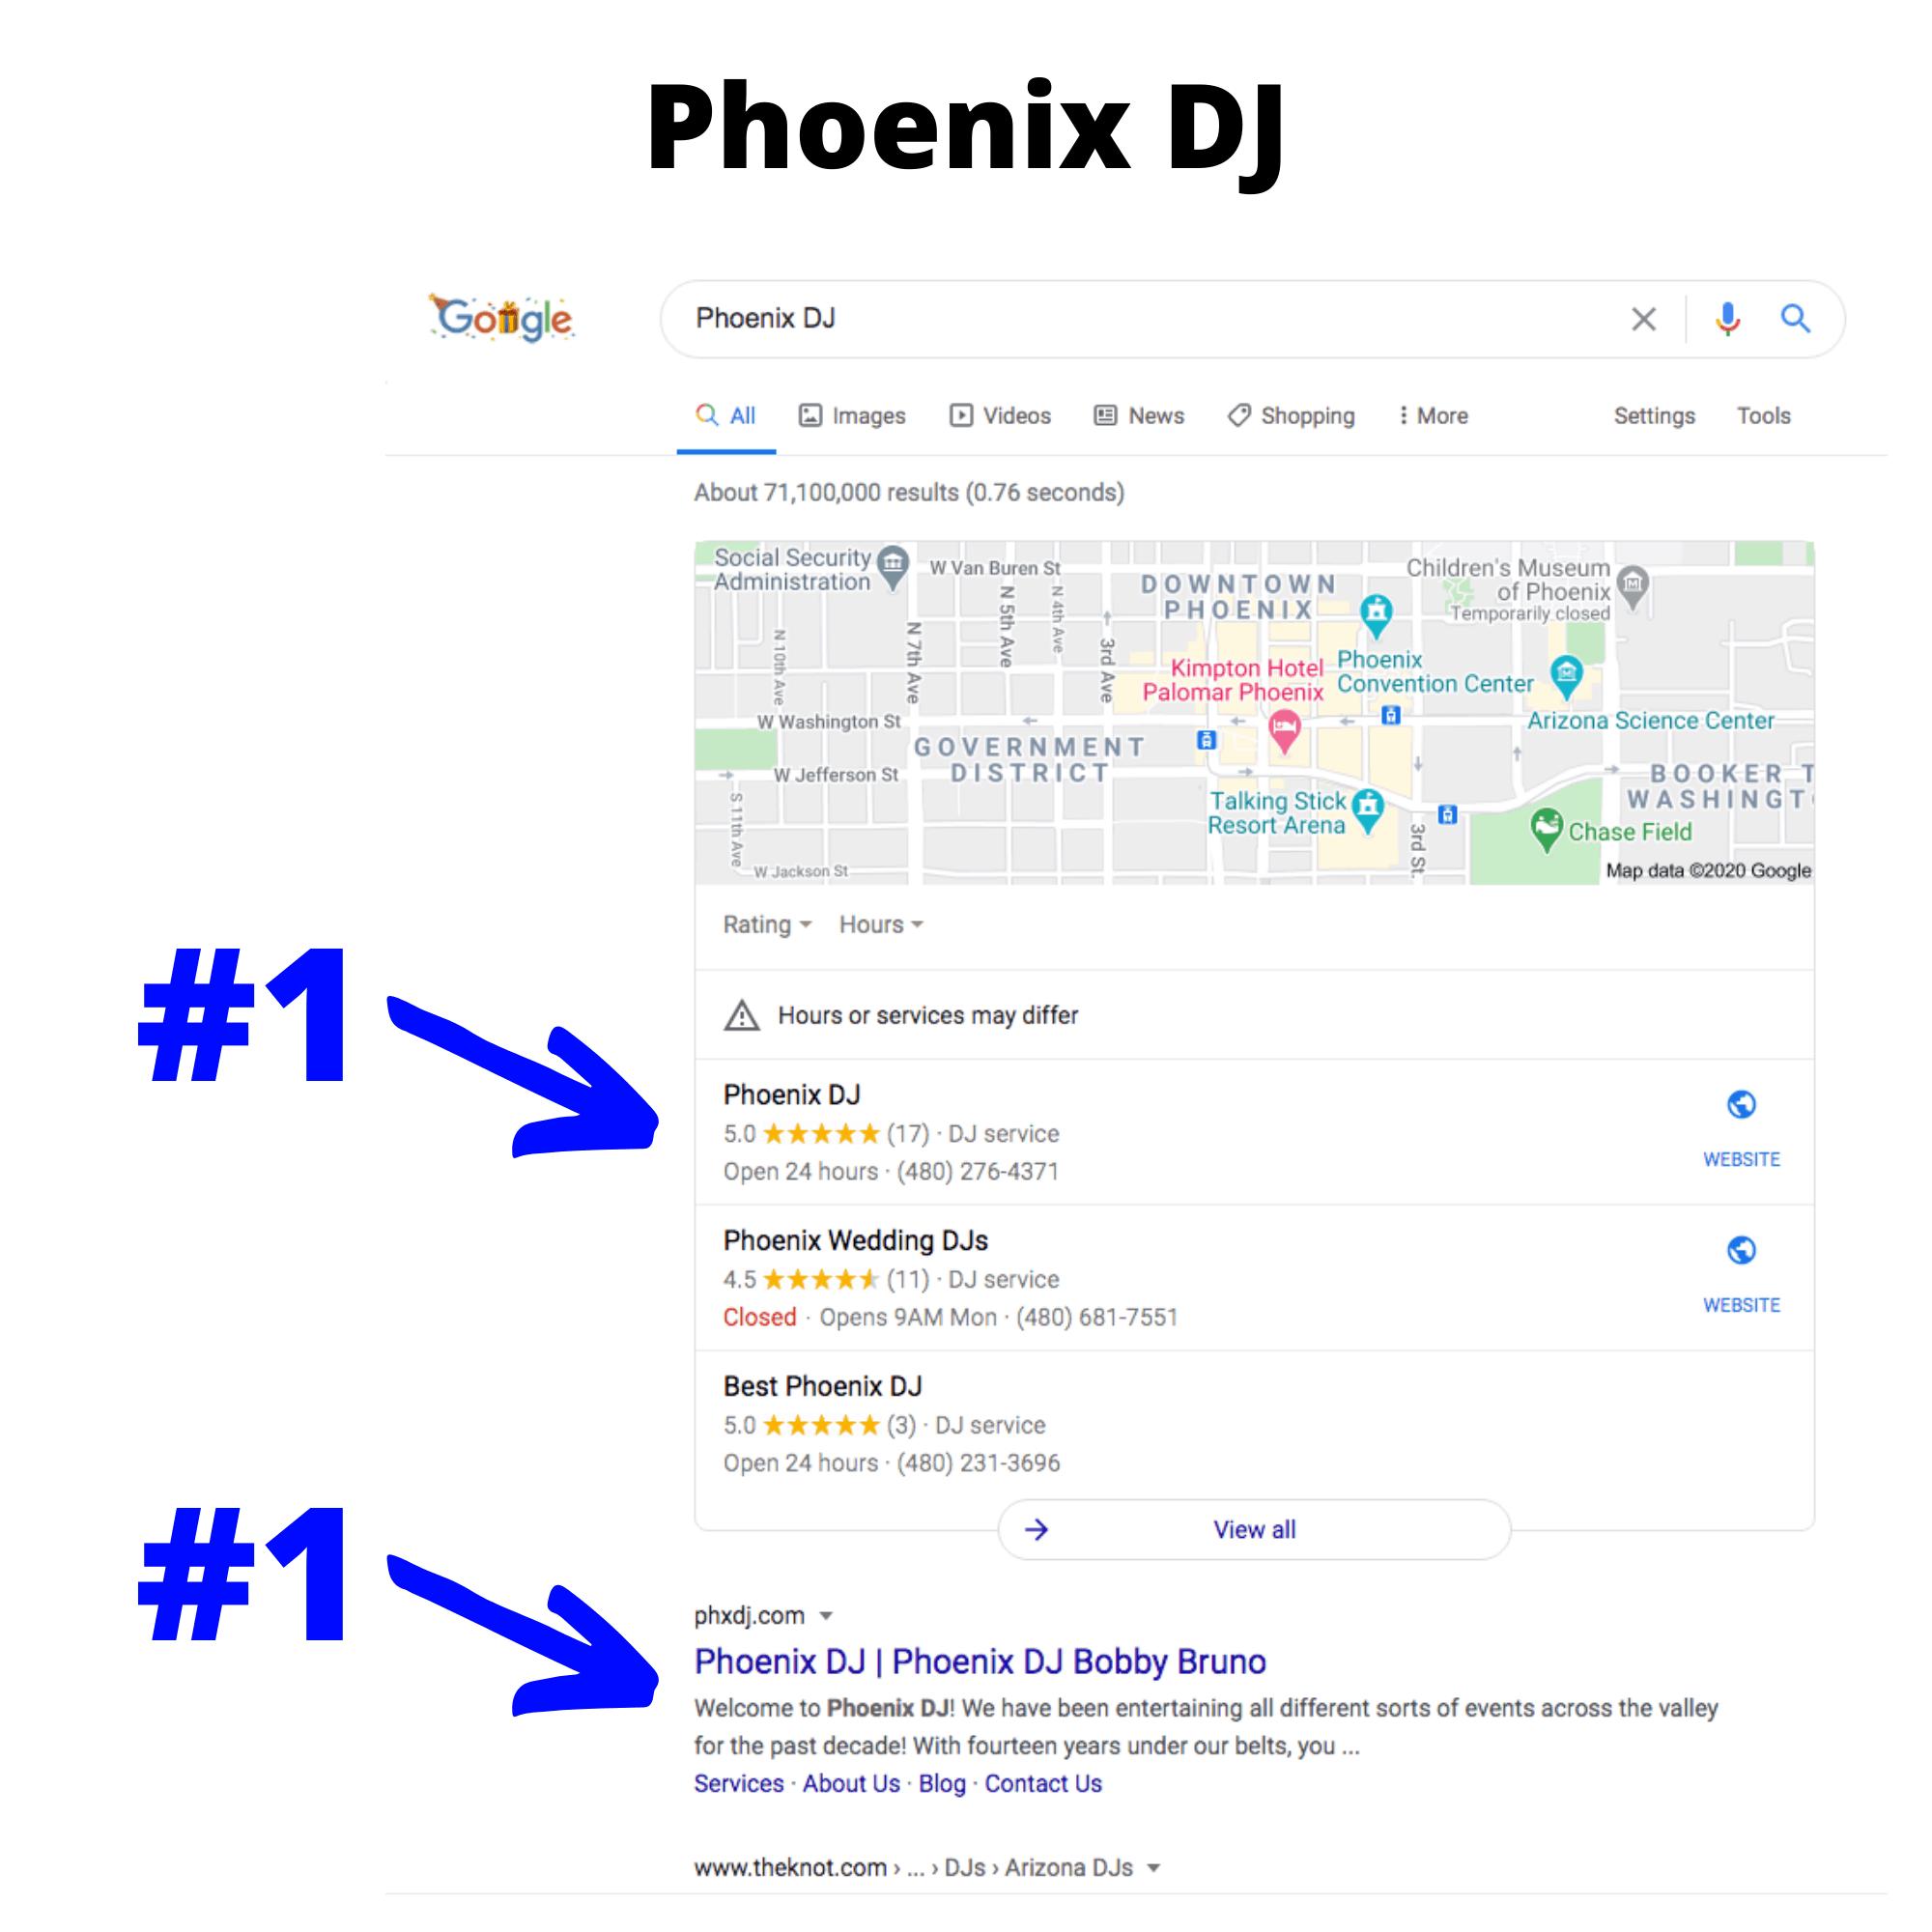 Phoenix DJ search results